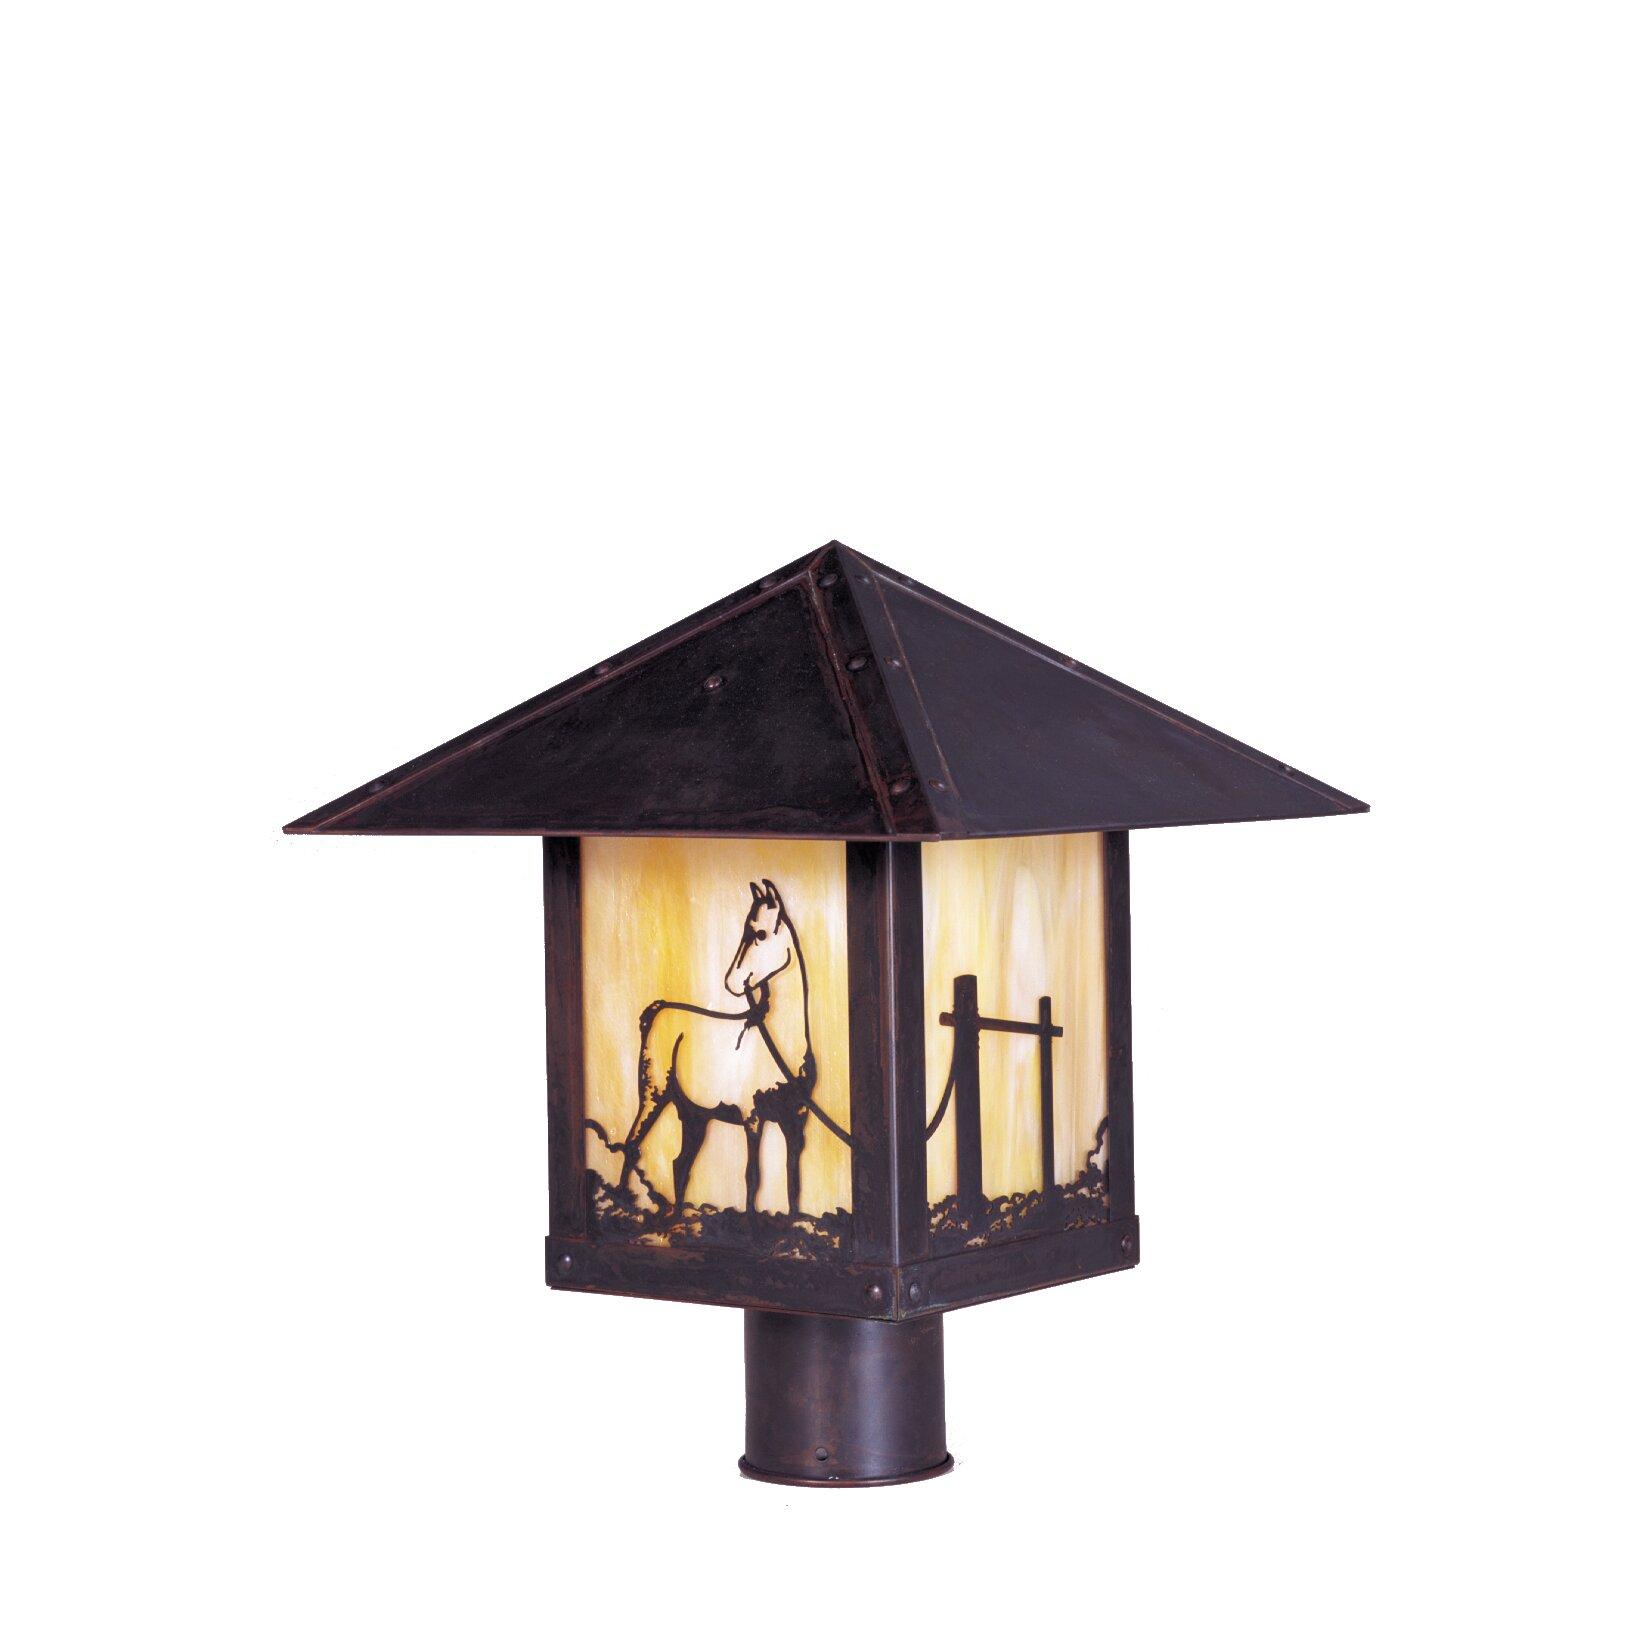 Arroyo Craftsman Timber Ridge 1 Light Outdoor Post Light